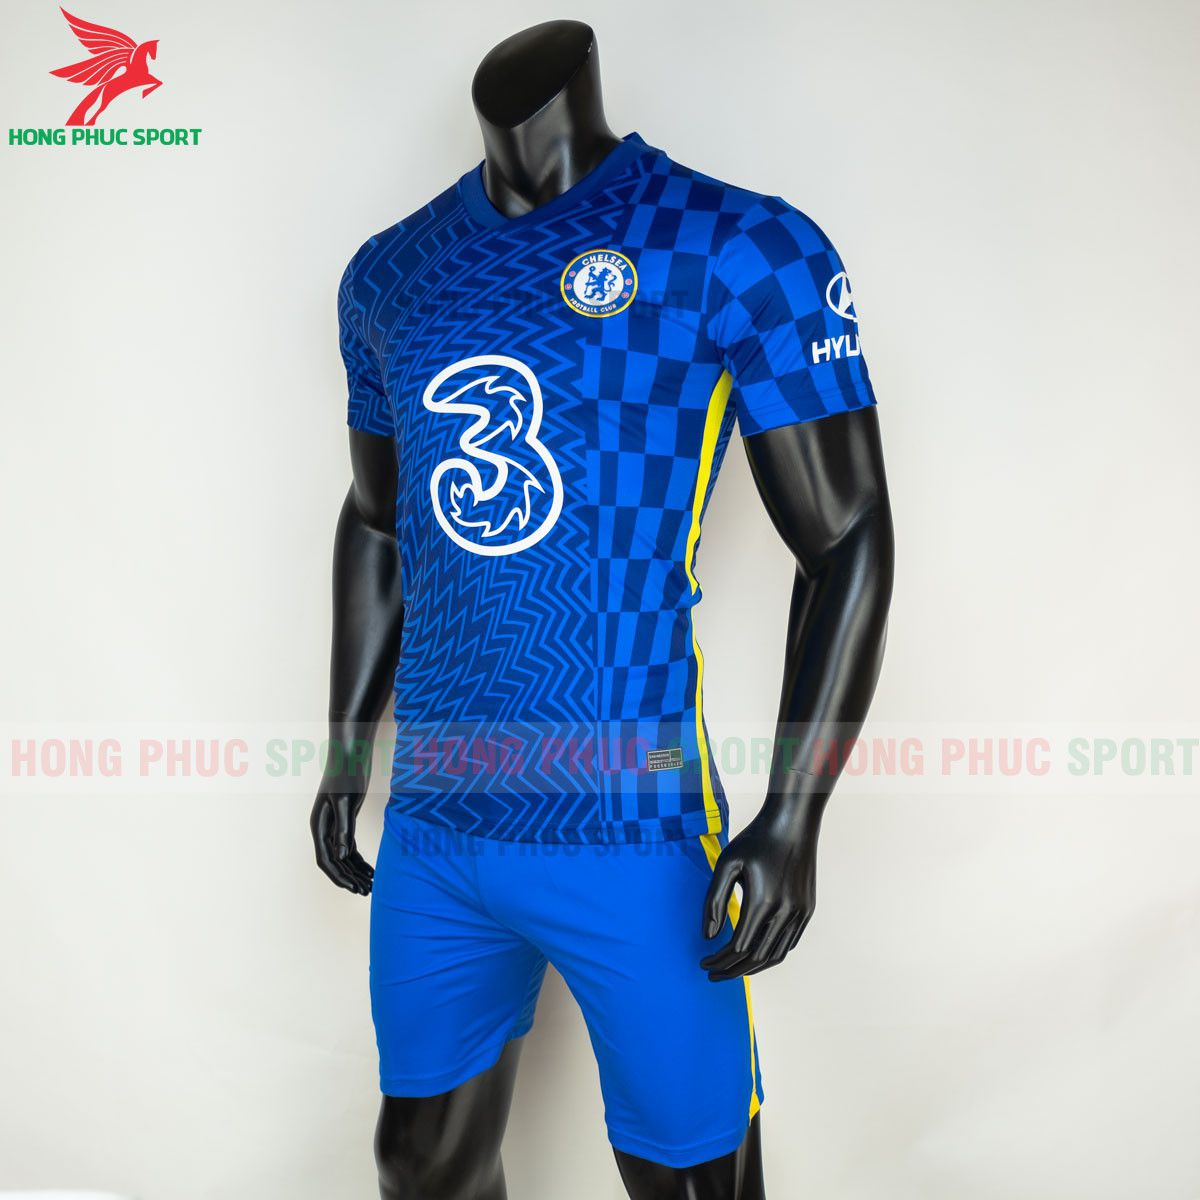 https://cdn.hongphucsport.com/unsafe/s4.shopbay.vn/files/285/ao-bong-da-chelsea-2021-2022-san-nha-hang-thai-4-60d2fbb955601.jpg